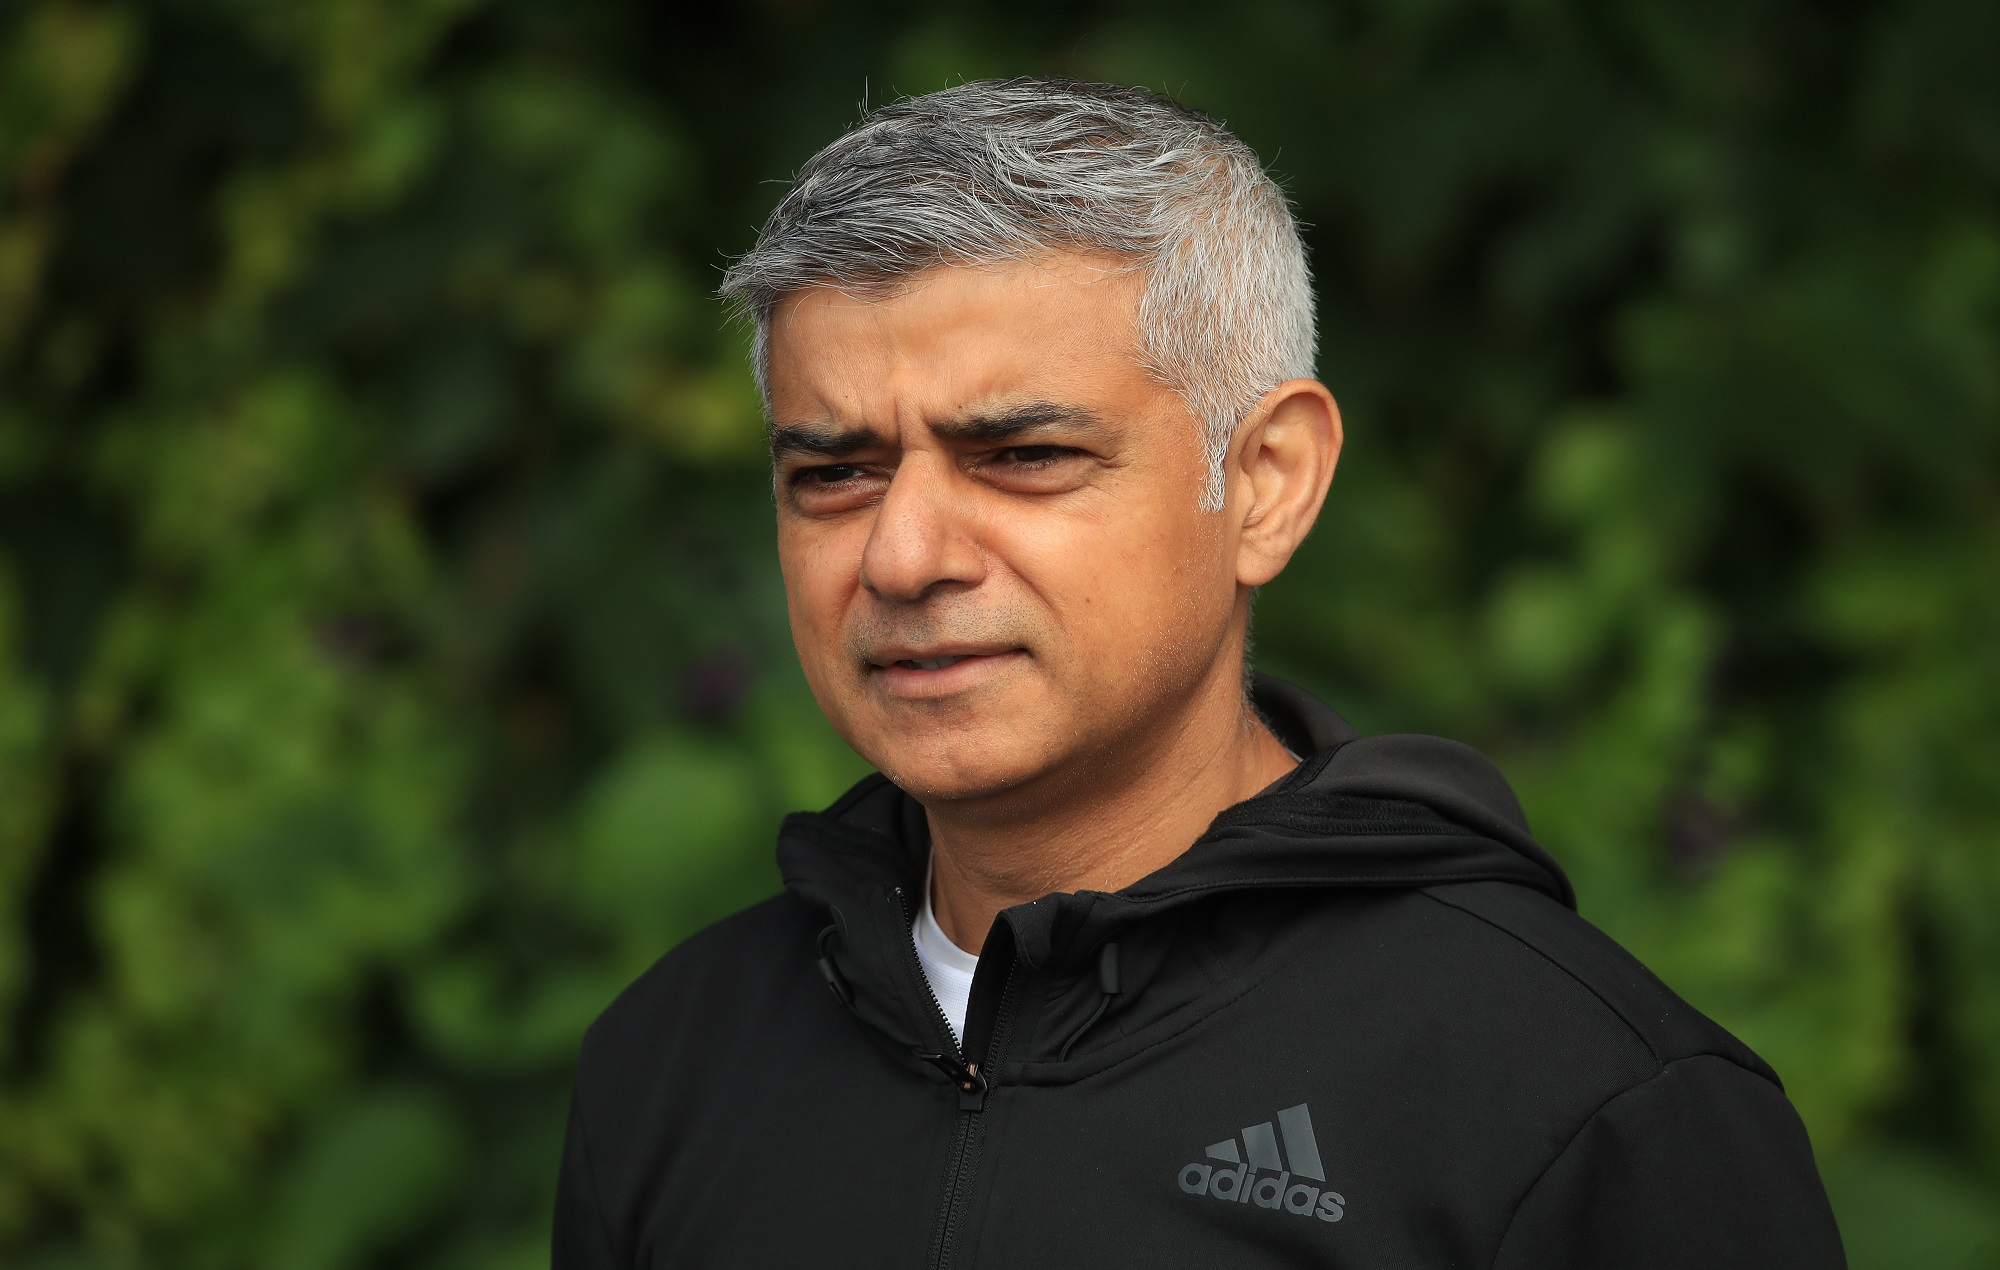 Sadiq Khan pledges £450,000 to help London grassroot music venues hit by COVID-19